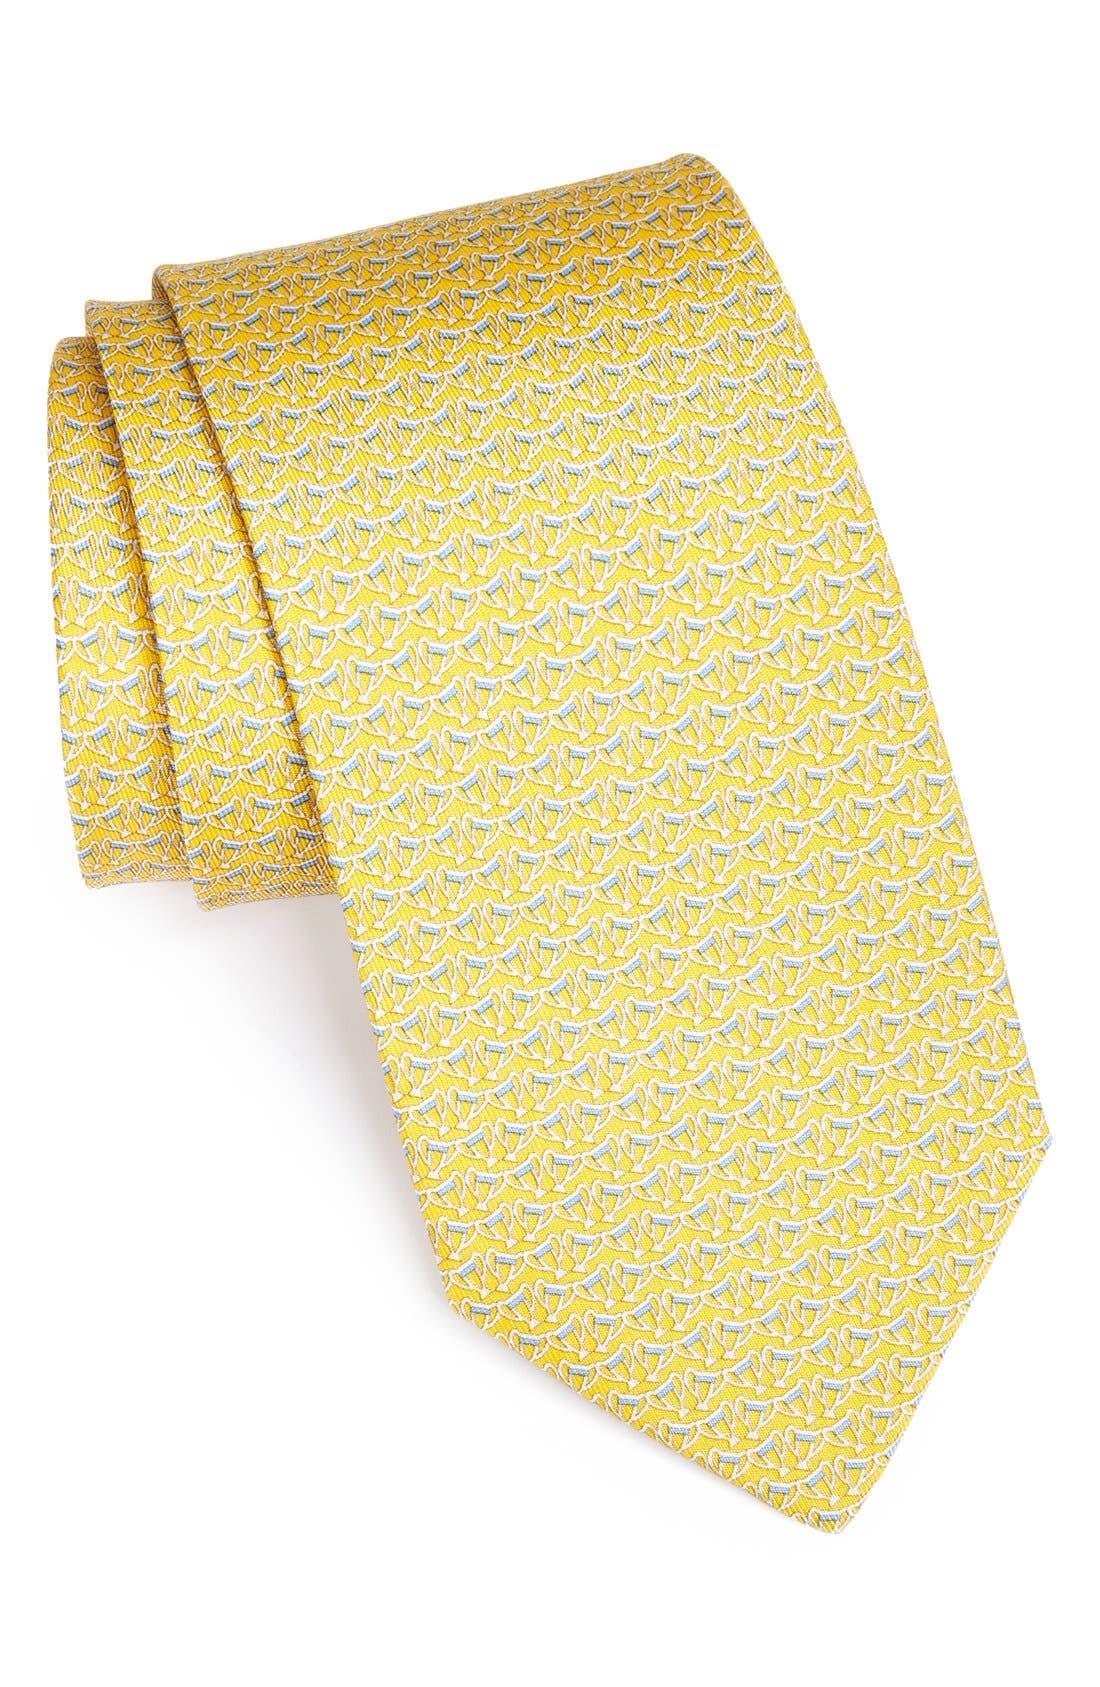 Main Image - Salvatore Ferragamo Cup Print Tie